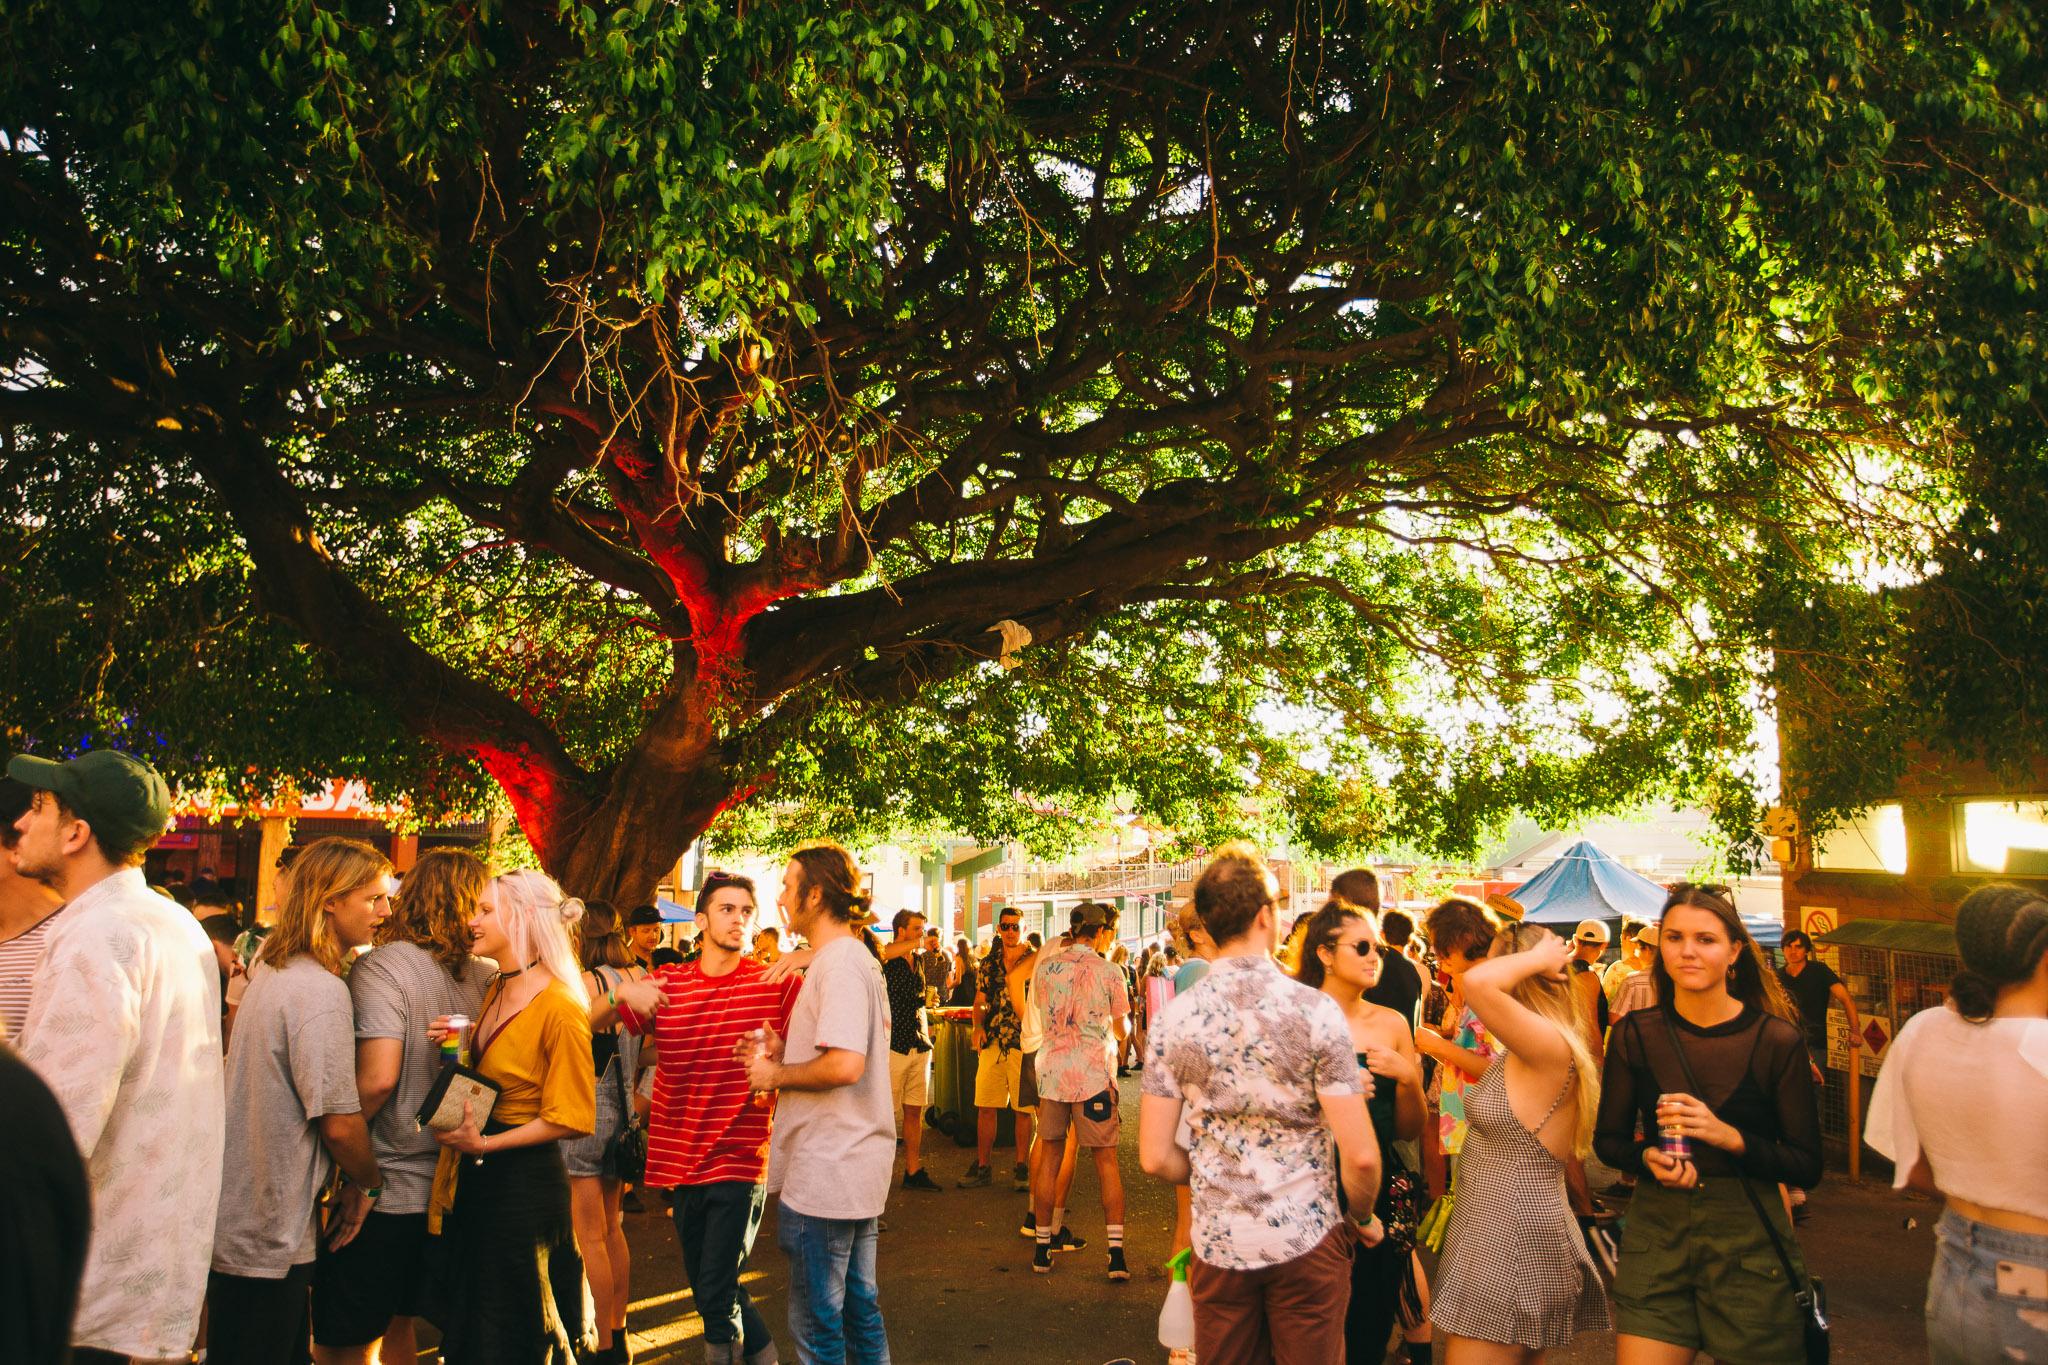 Atmosphere_Laneway-Festival-Brisbane-2018_Credit-Bianca-Holderness-82.jpg